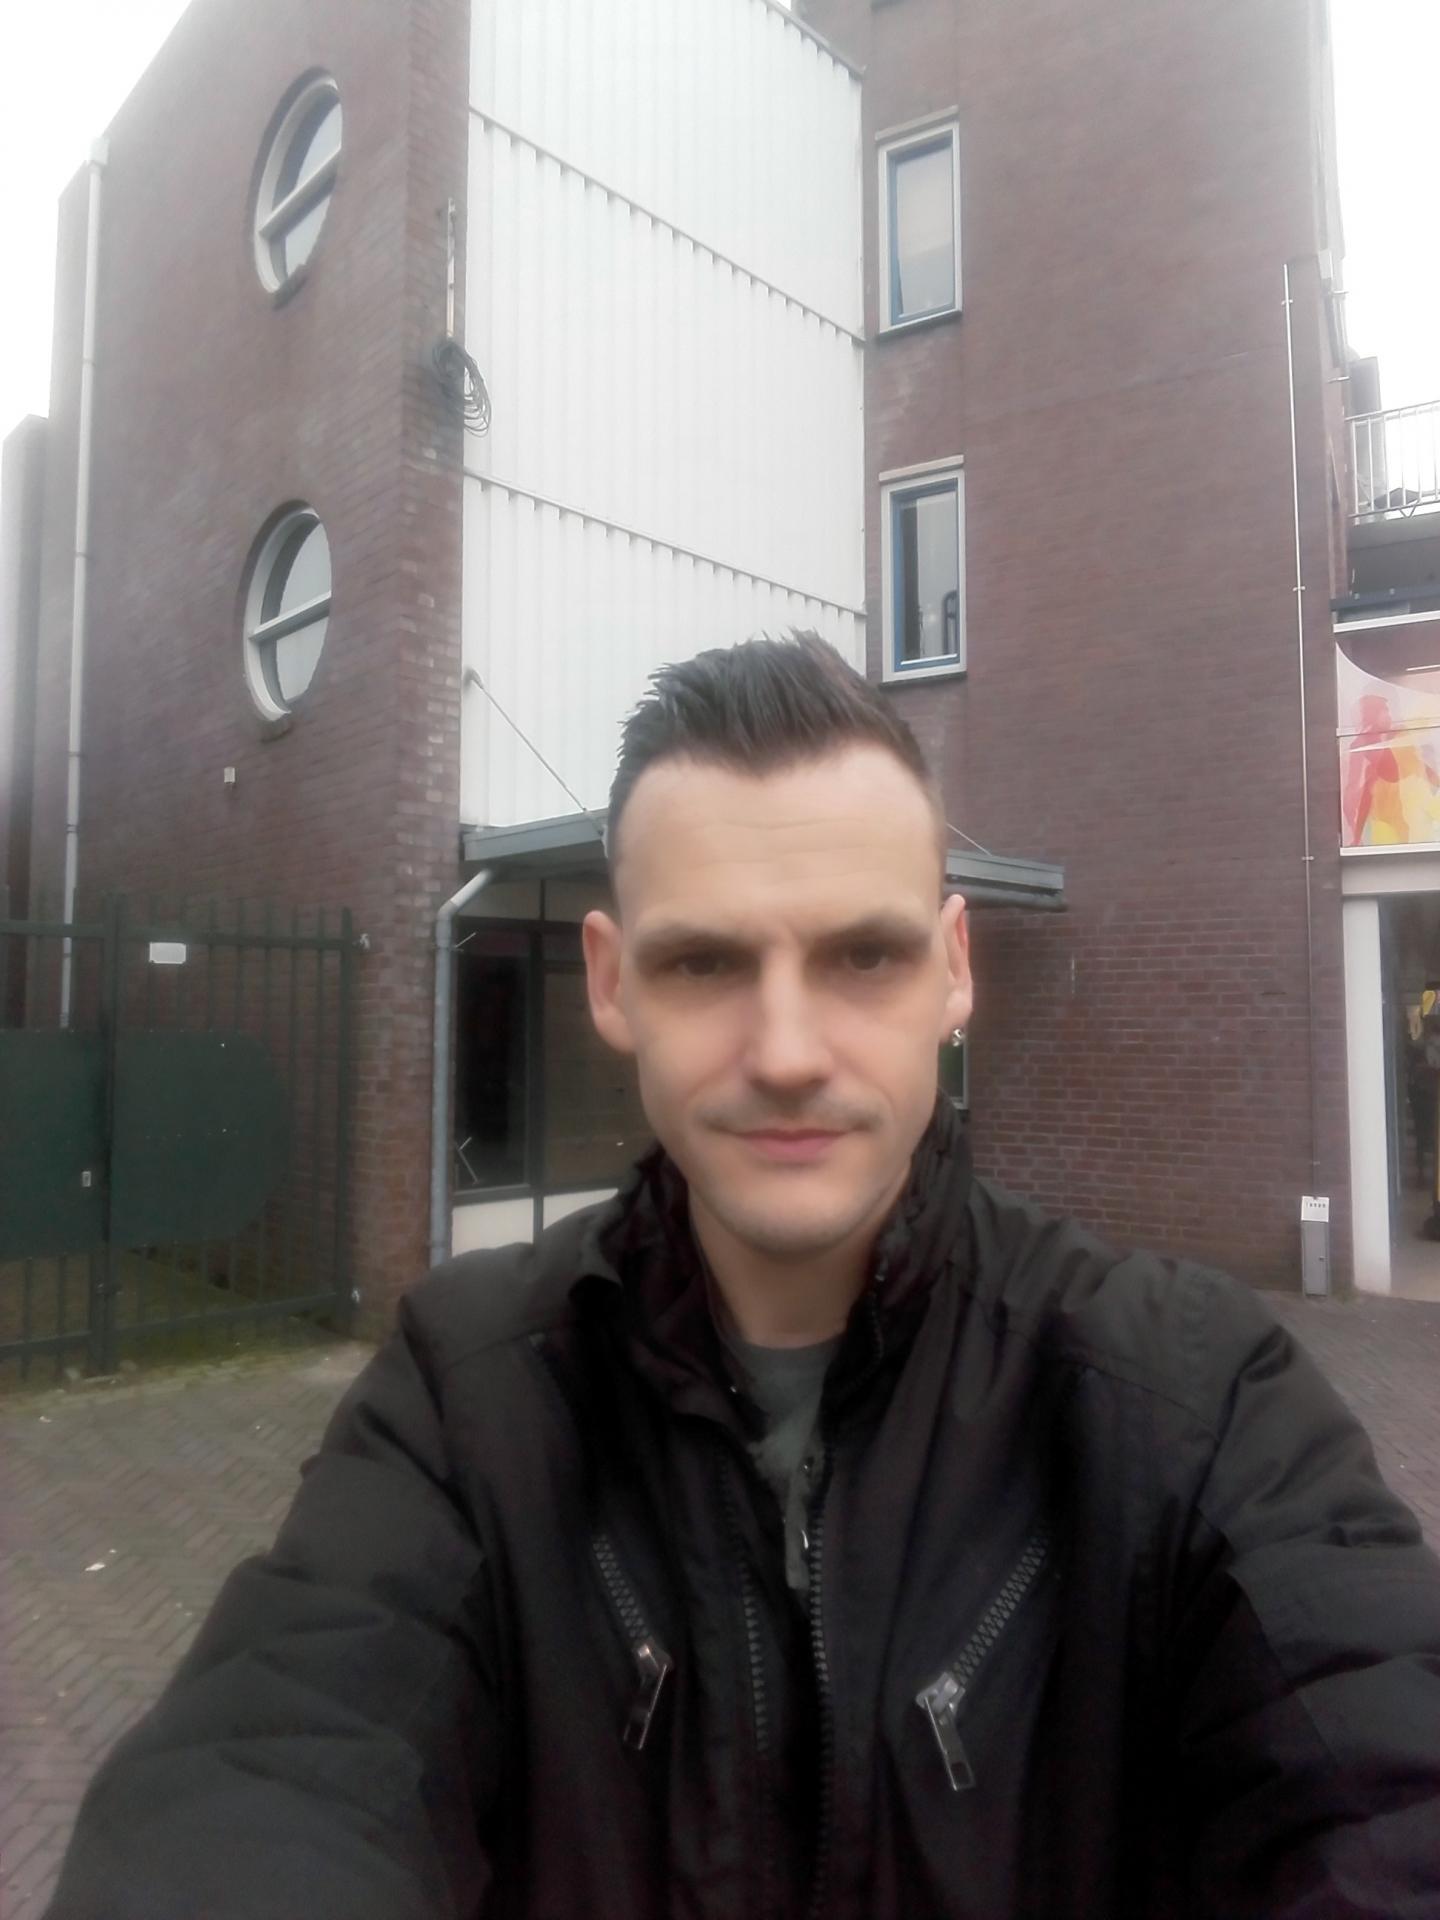 fire41 uit Limburg,Nederland